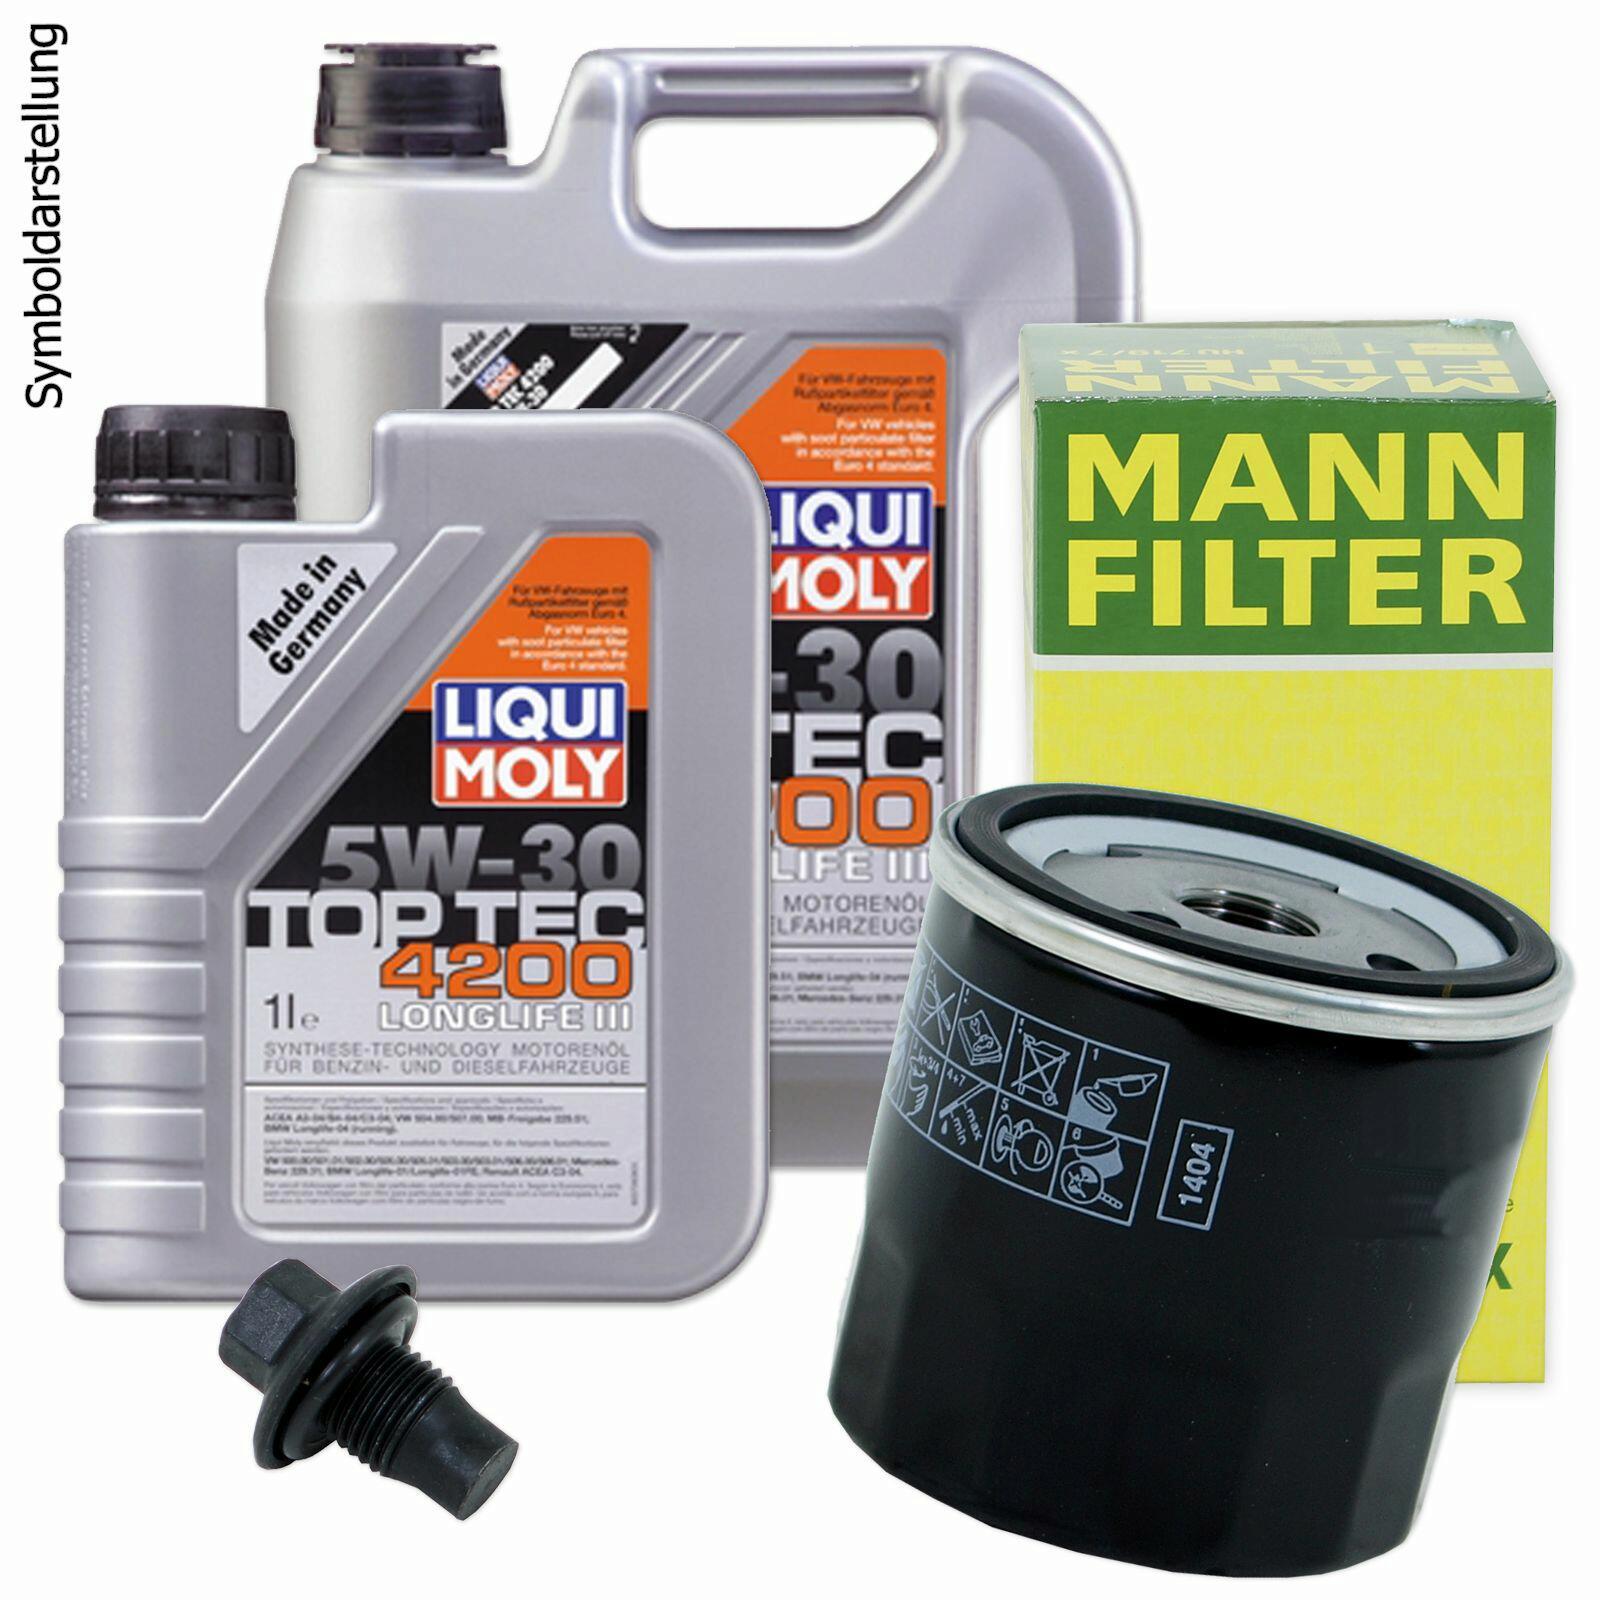 Ölwechsel Set 6L 5W30 Öl Motoröl LIQUI MOLY + MANN Ölfilter + Ablassschraube